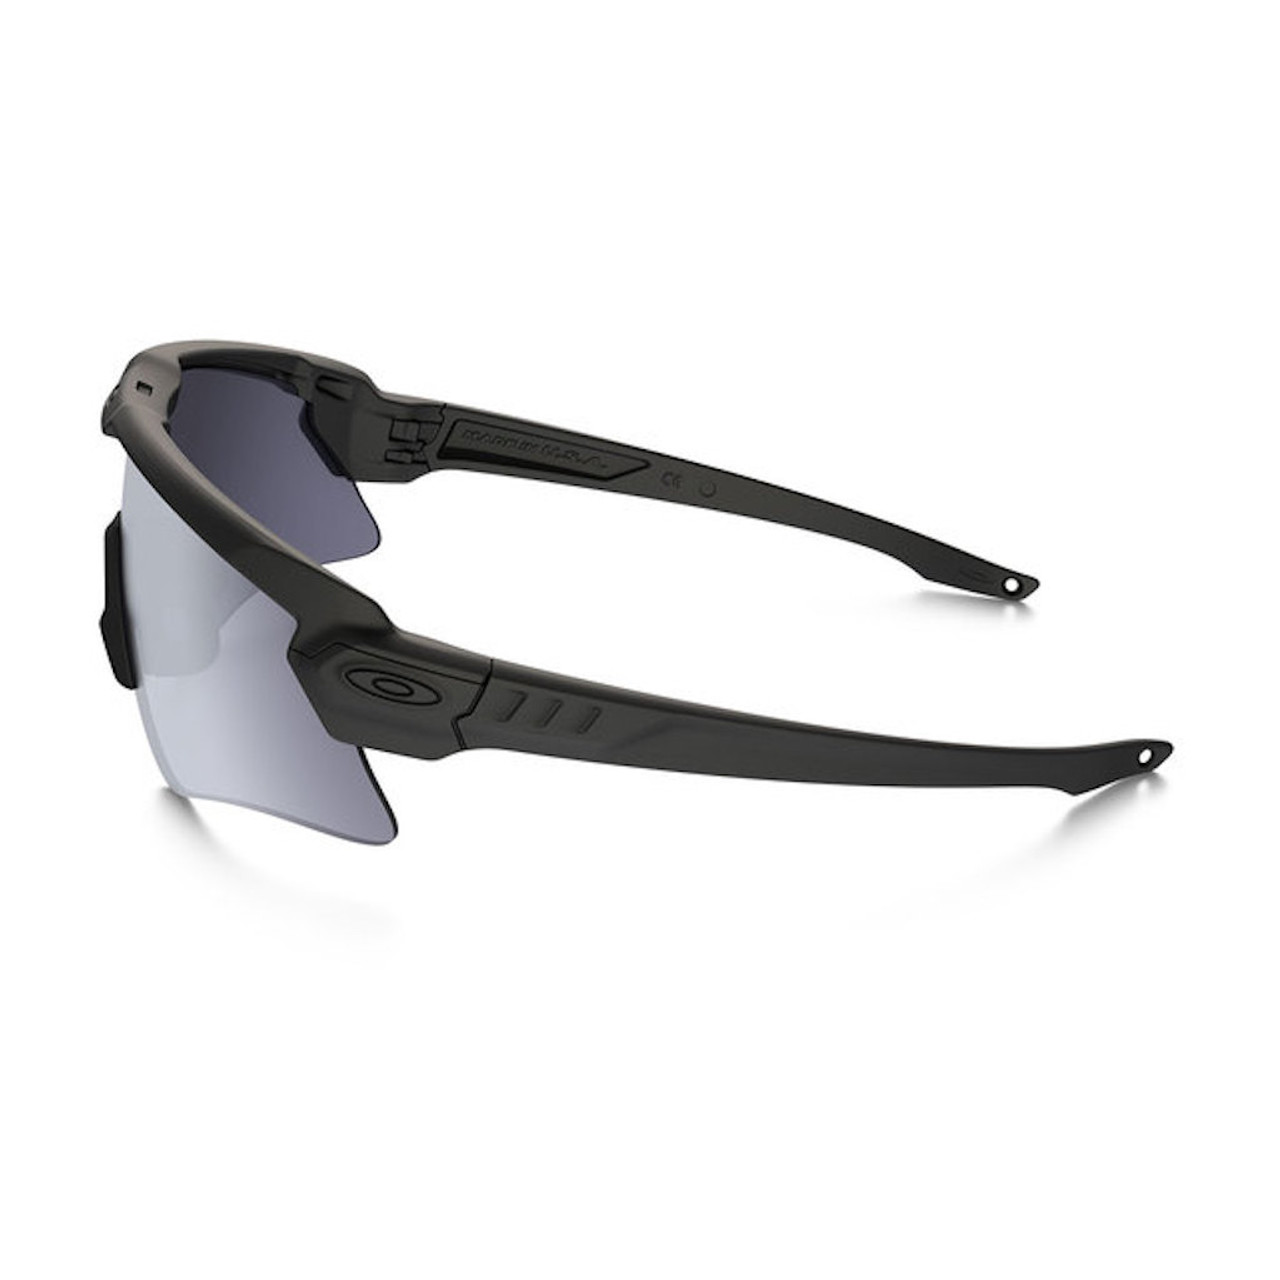 ec67289e02 ... Oakley SI Ballistic Alpha Matte Black M Frame Grey Lenses